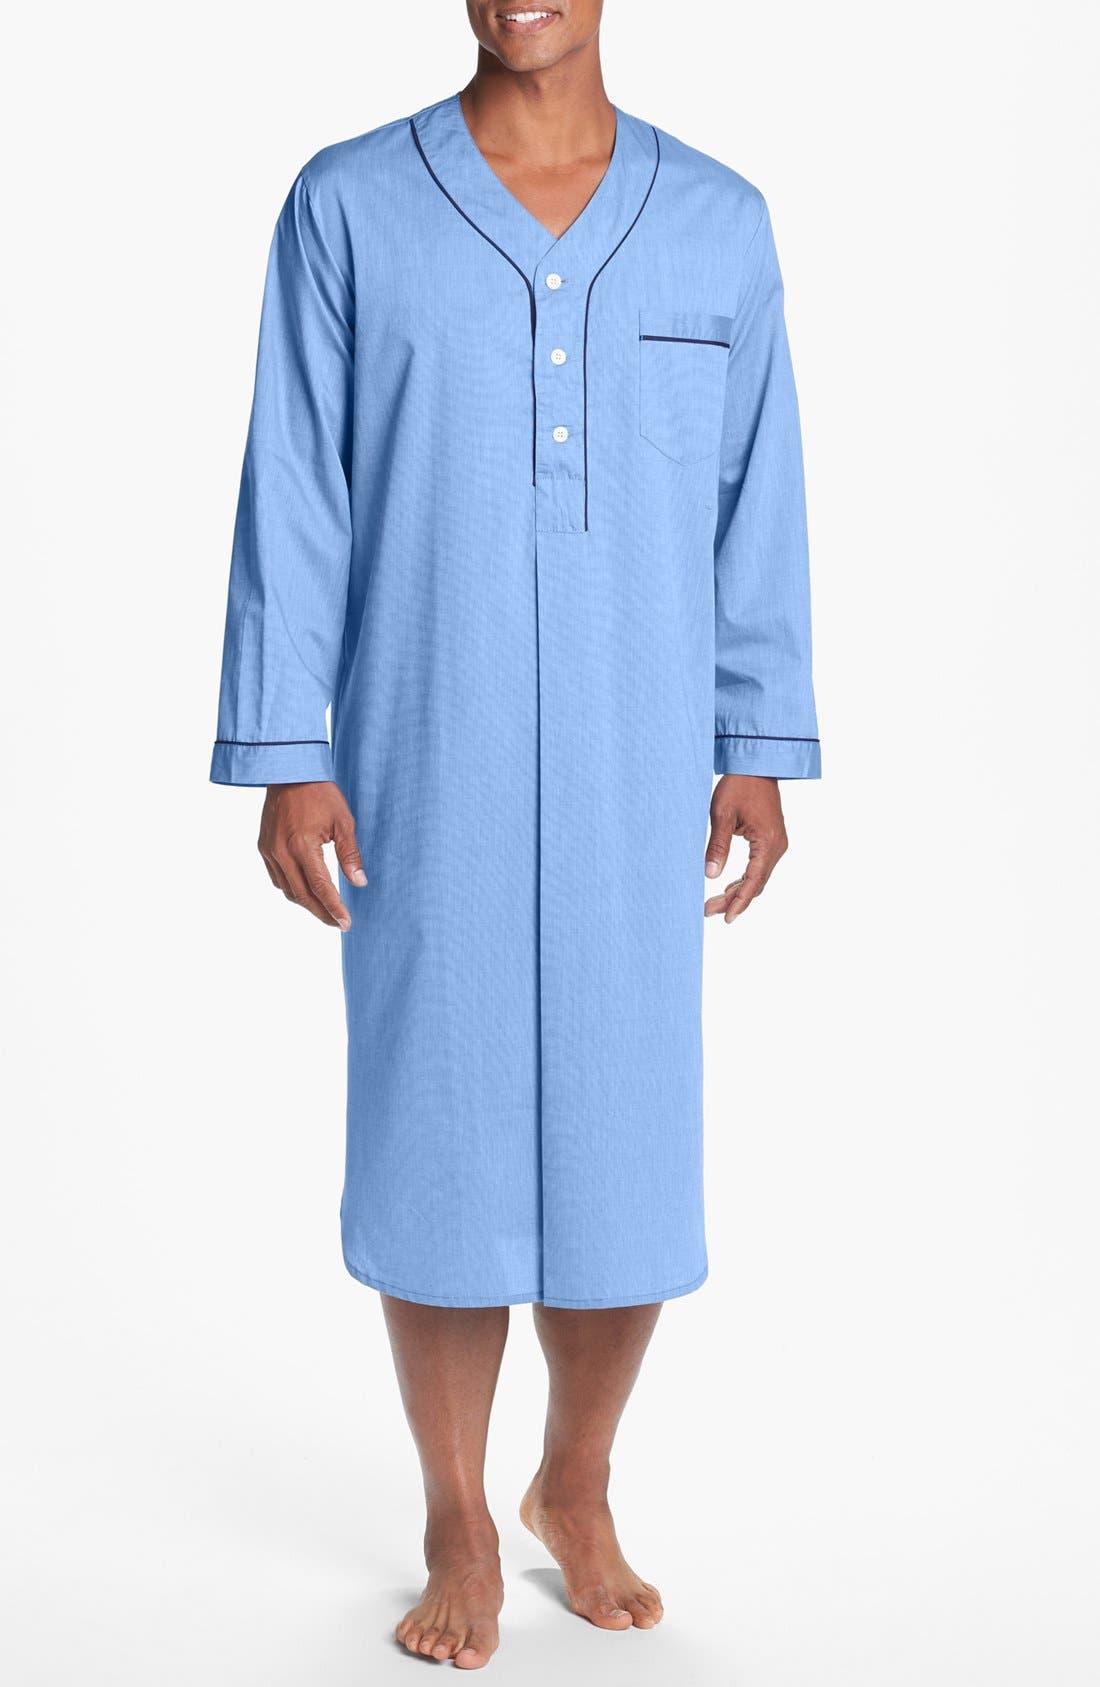 Cotton Nightshirt,                             Main thumbnail 1, color,                             BLUE